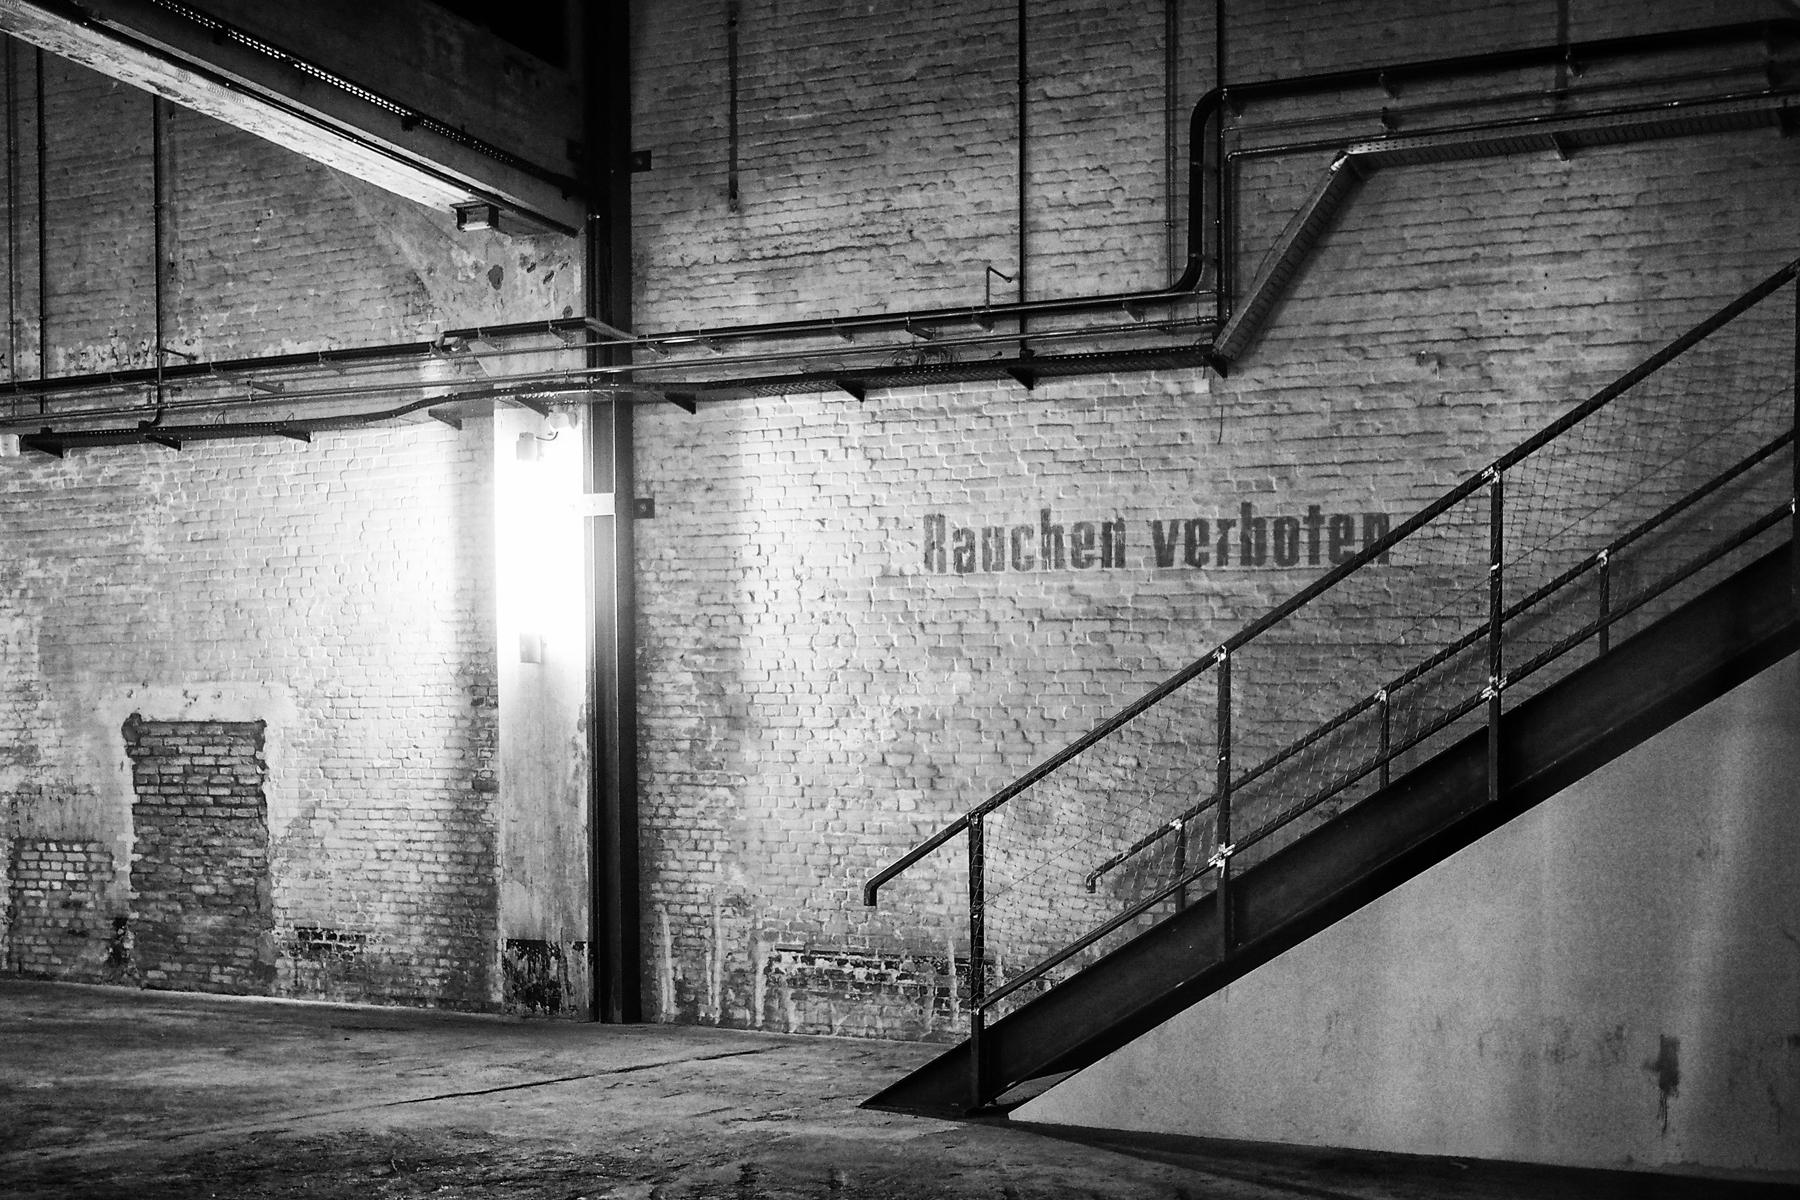 Berlin - Shedhalle Funkhaus, Monom